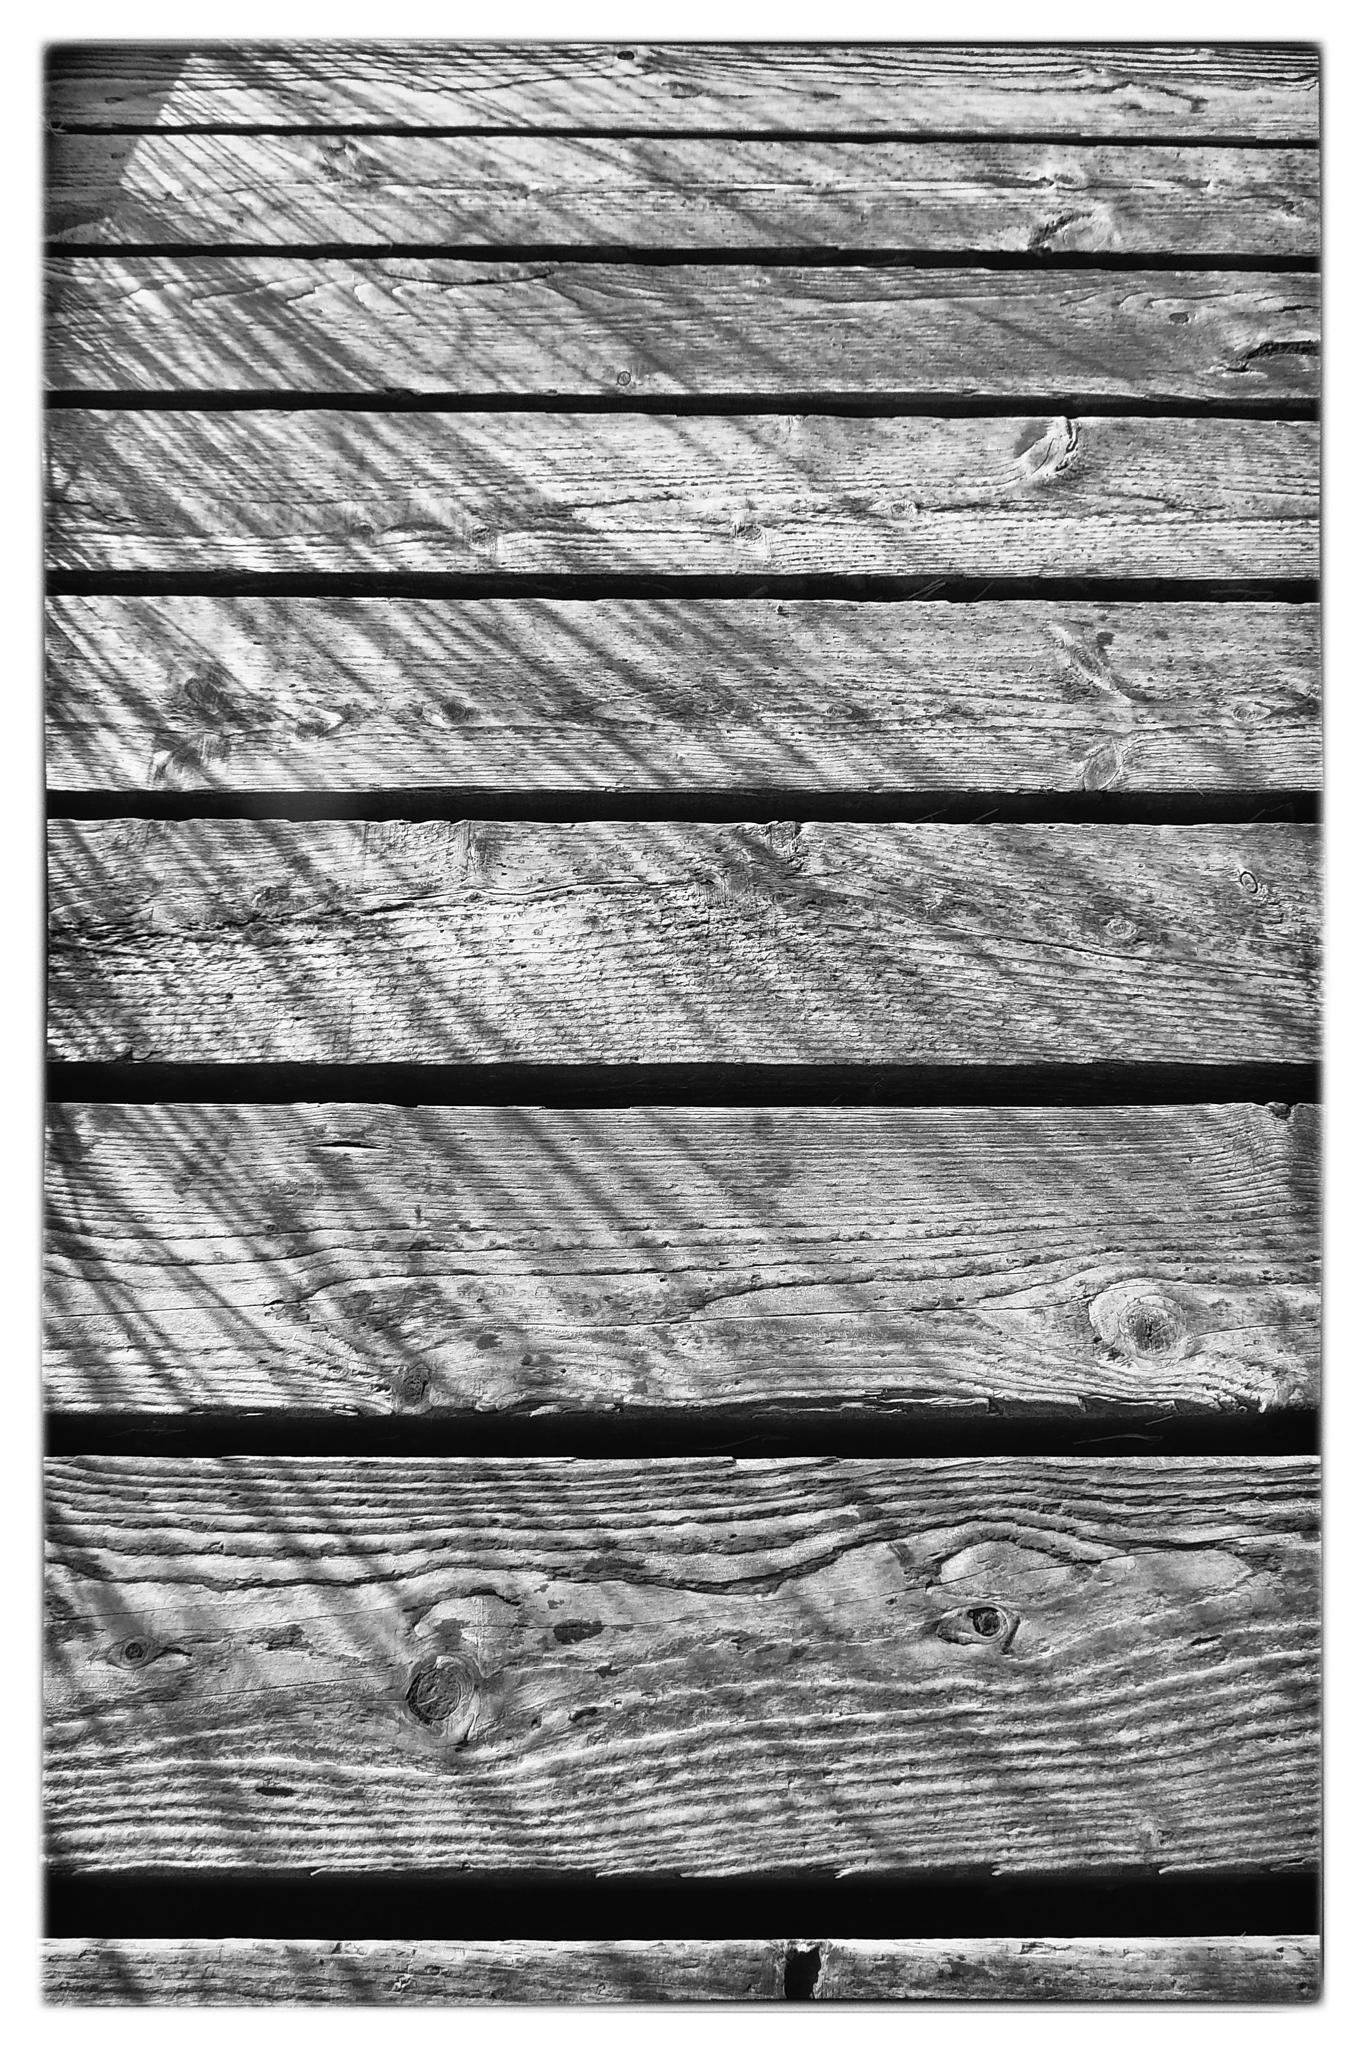 Sedge Shadows by isegarth